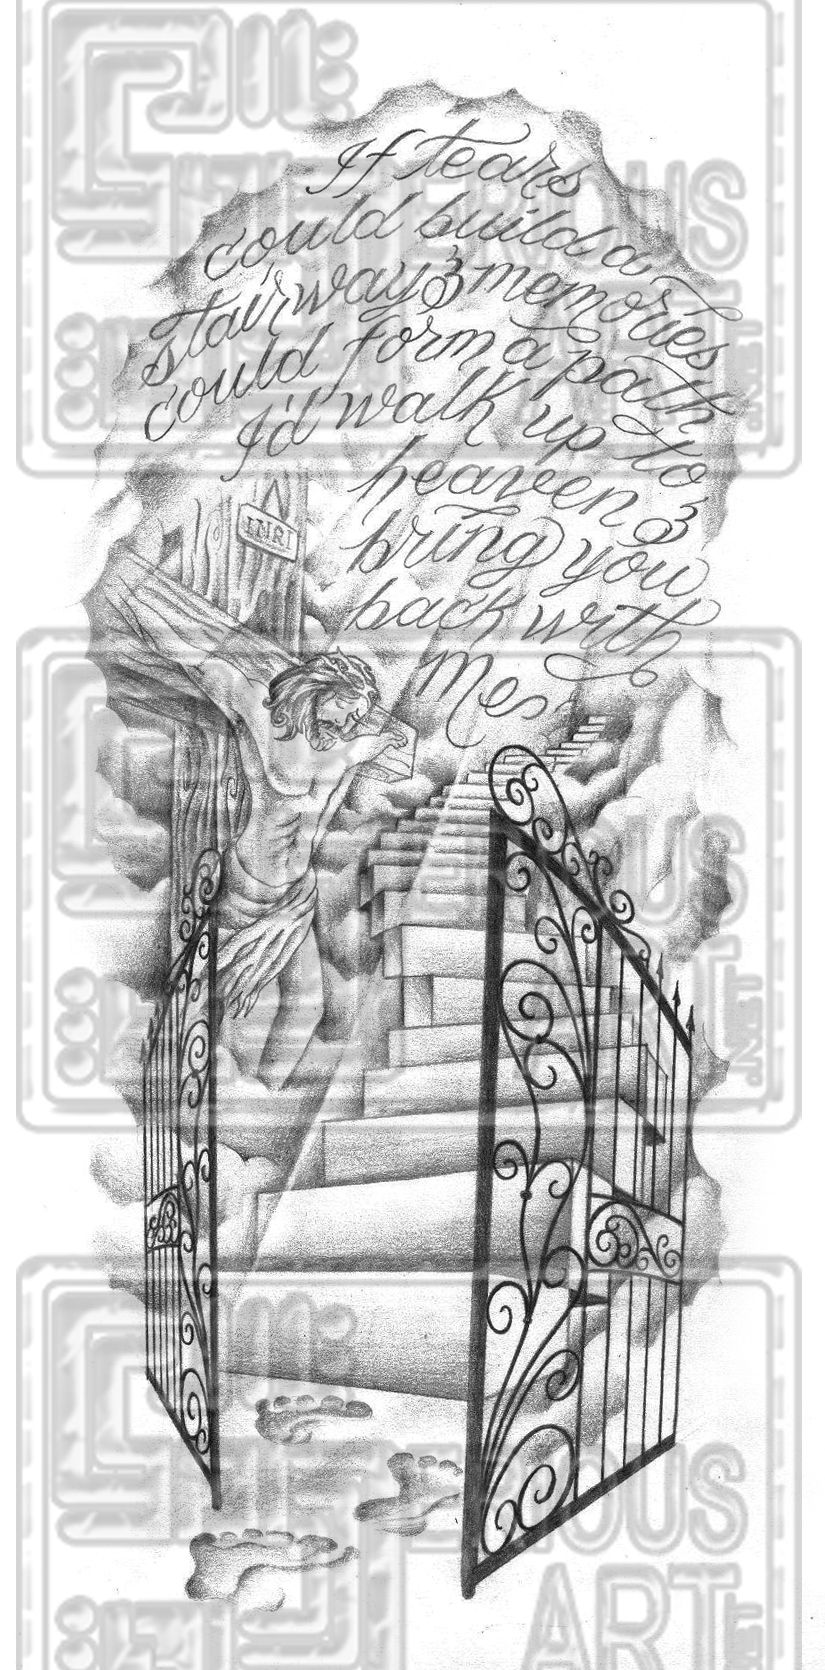 stairway to heaven tattoos original stairway tattoo tattoos and piercings pinterest. Black Bedroom Furniture Sets. Home Design Ideas